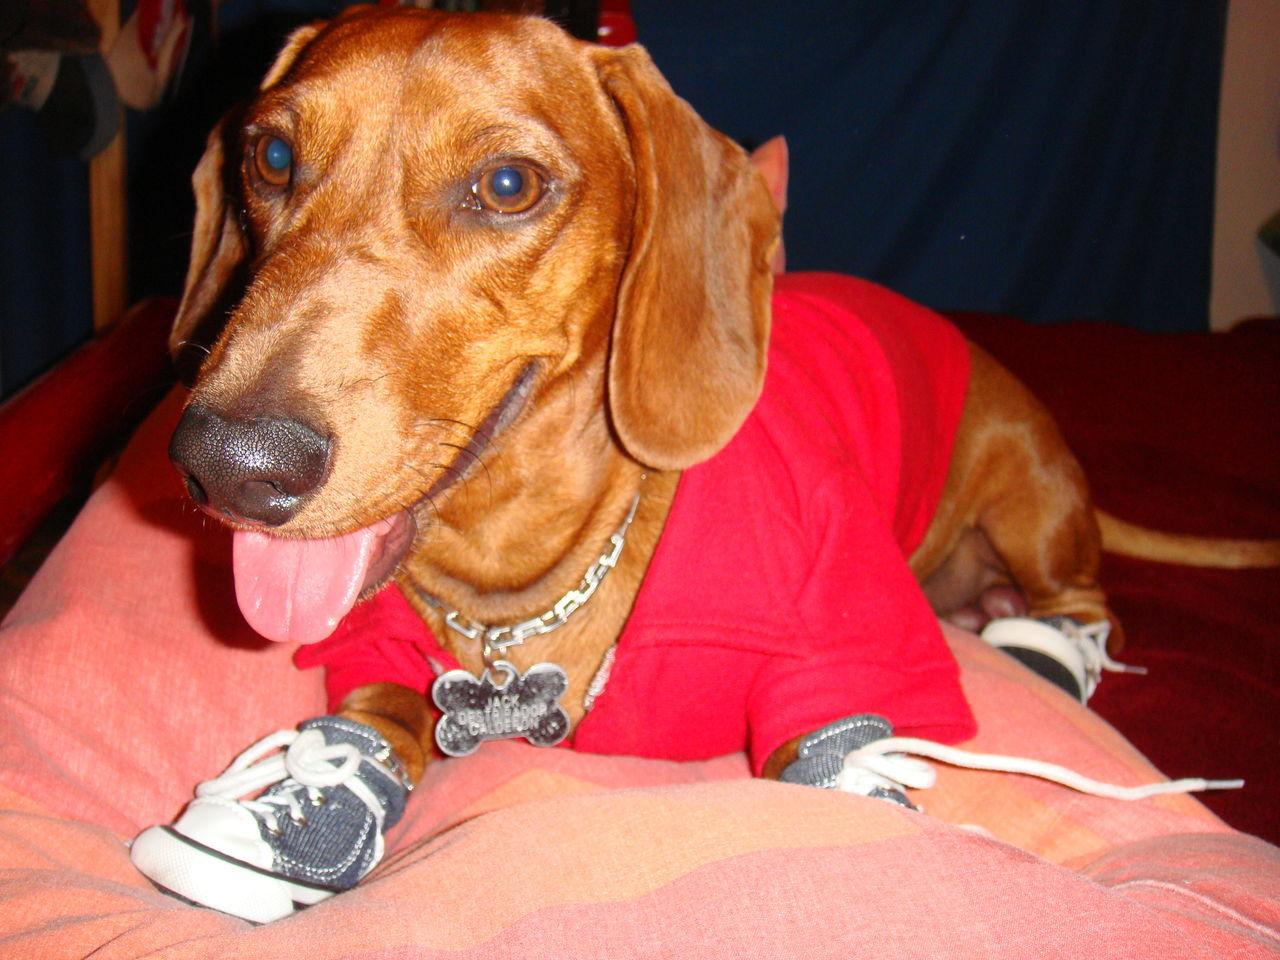 Dachshund Doxie Doxie Love Perro Salchicha Pets Teckel Wiener